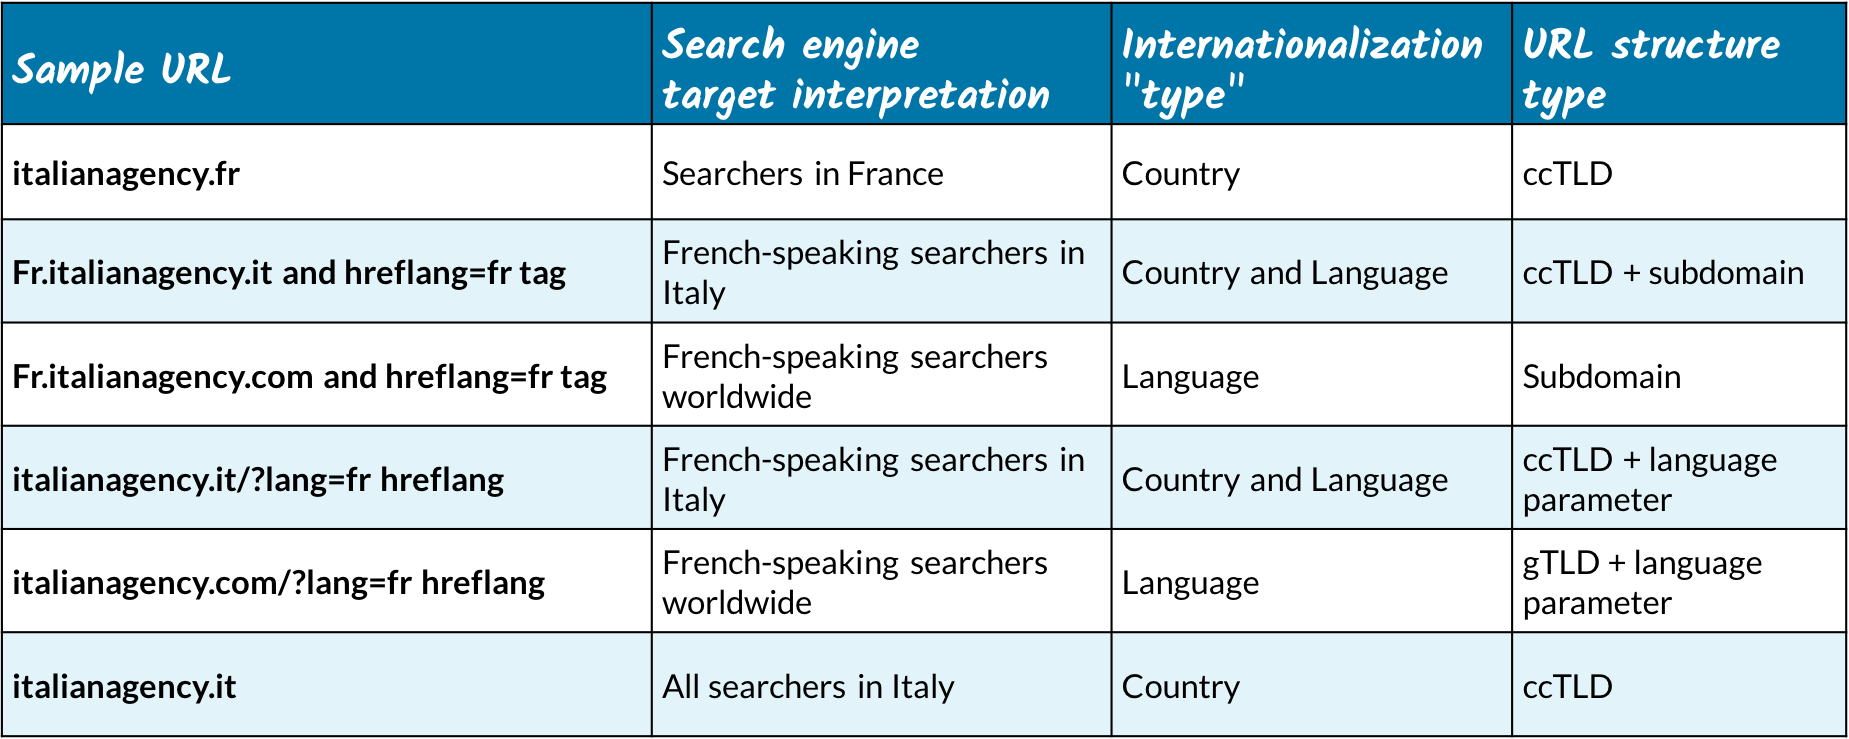 international-url-structures.png?mtime=20170329114723#asset:4333:url